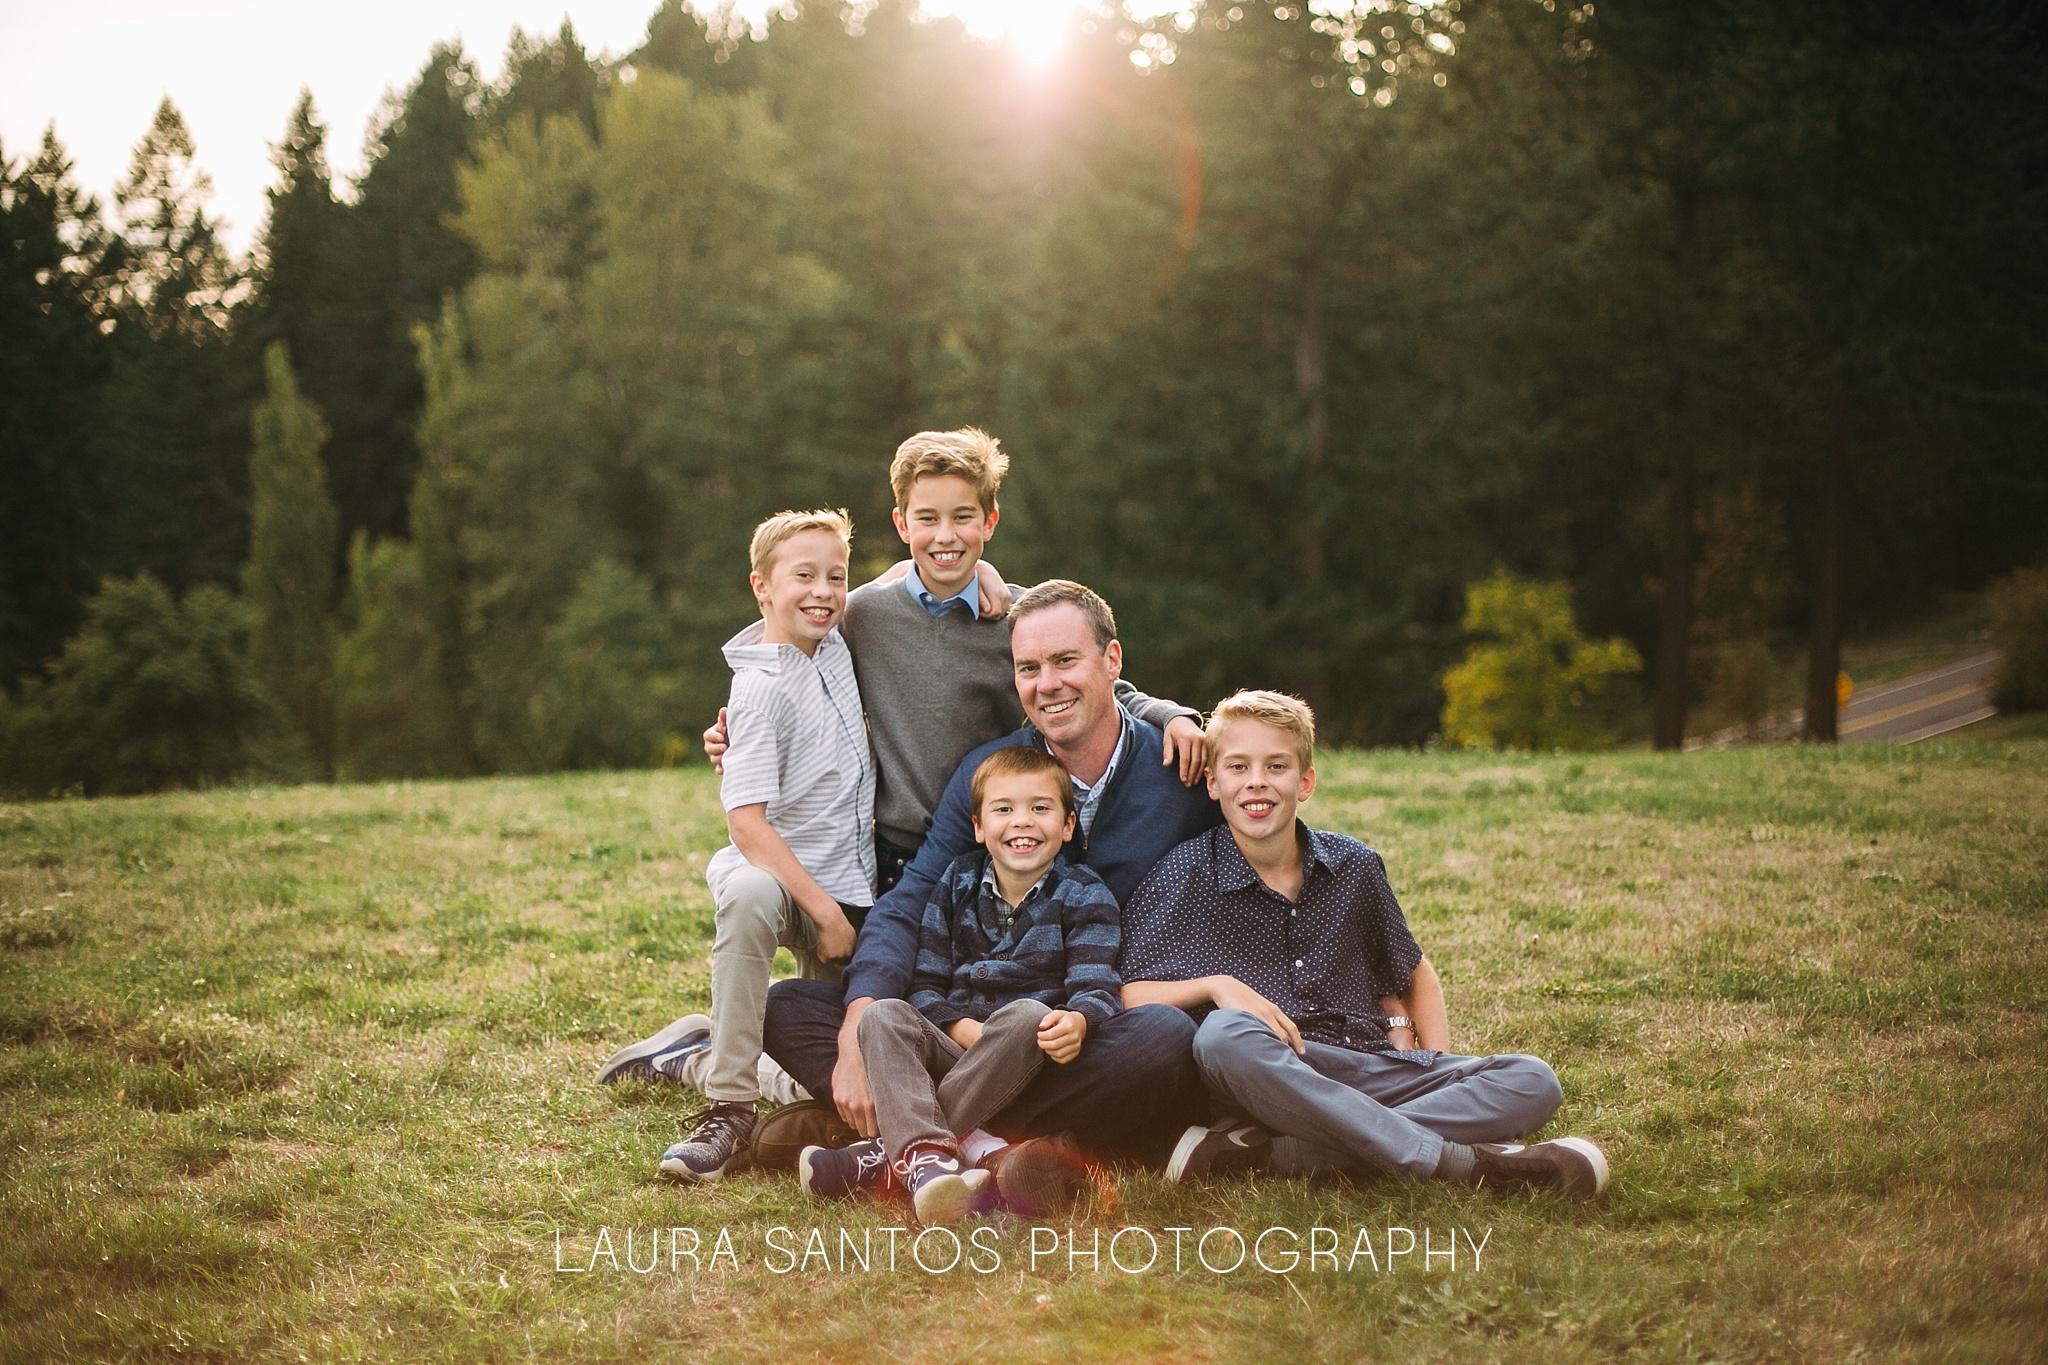 Laura Santos Photography Portland Oregon Family Photographer_0403.jpg